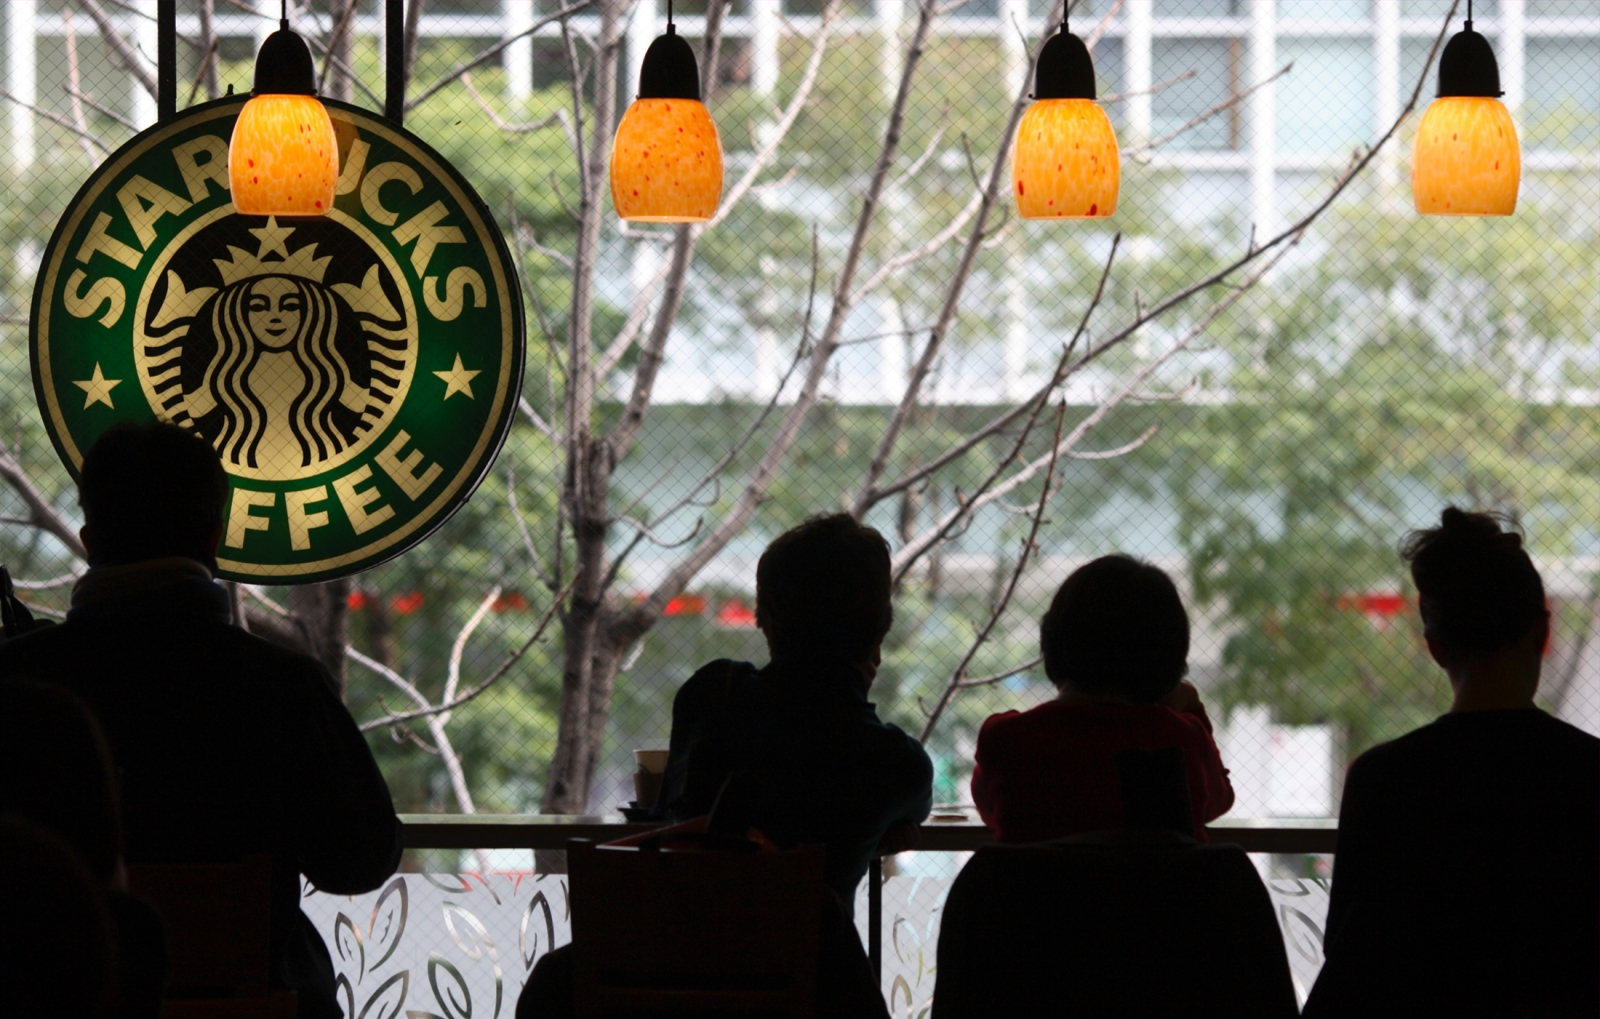 GC hacks Starbucks' servers to catch Adventist account holders